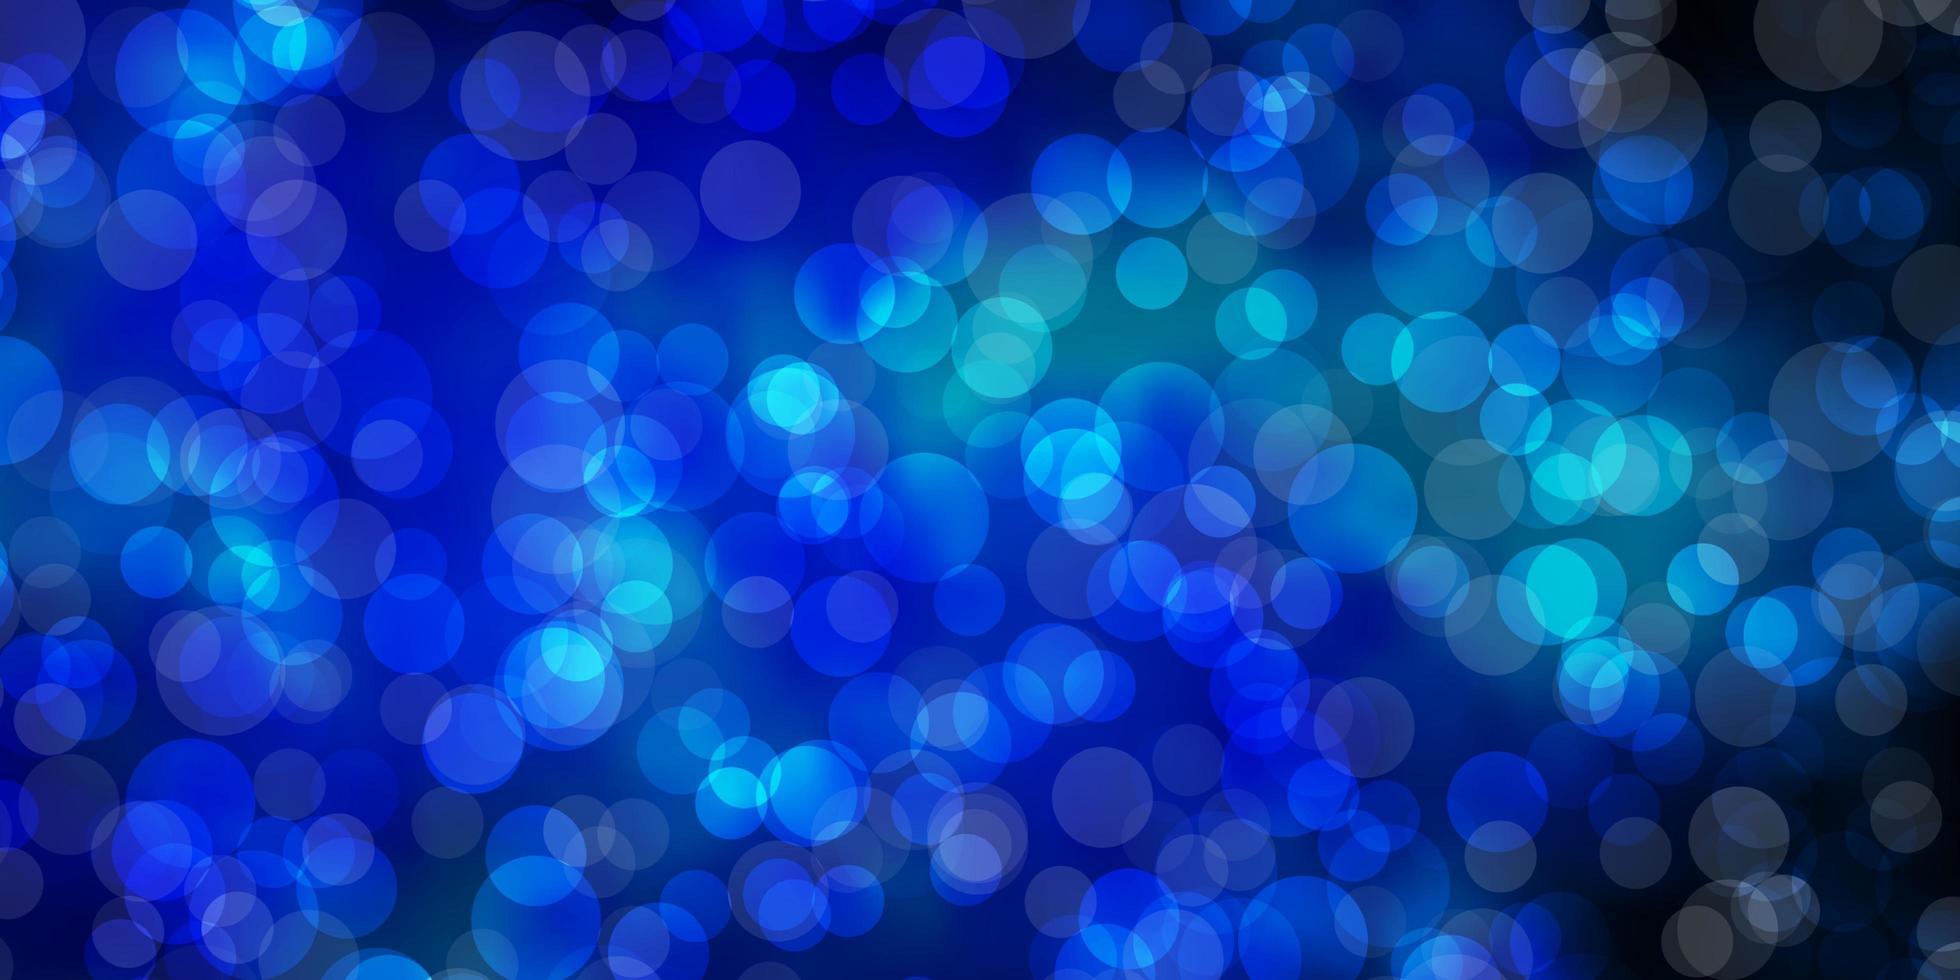 dunkelblaues Vektorlayout mit Kreisen. vektor